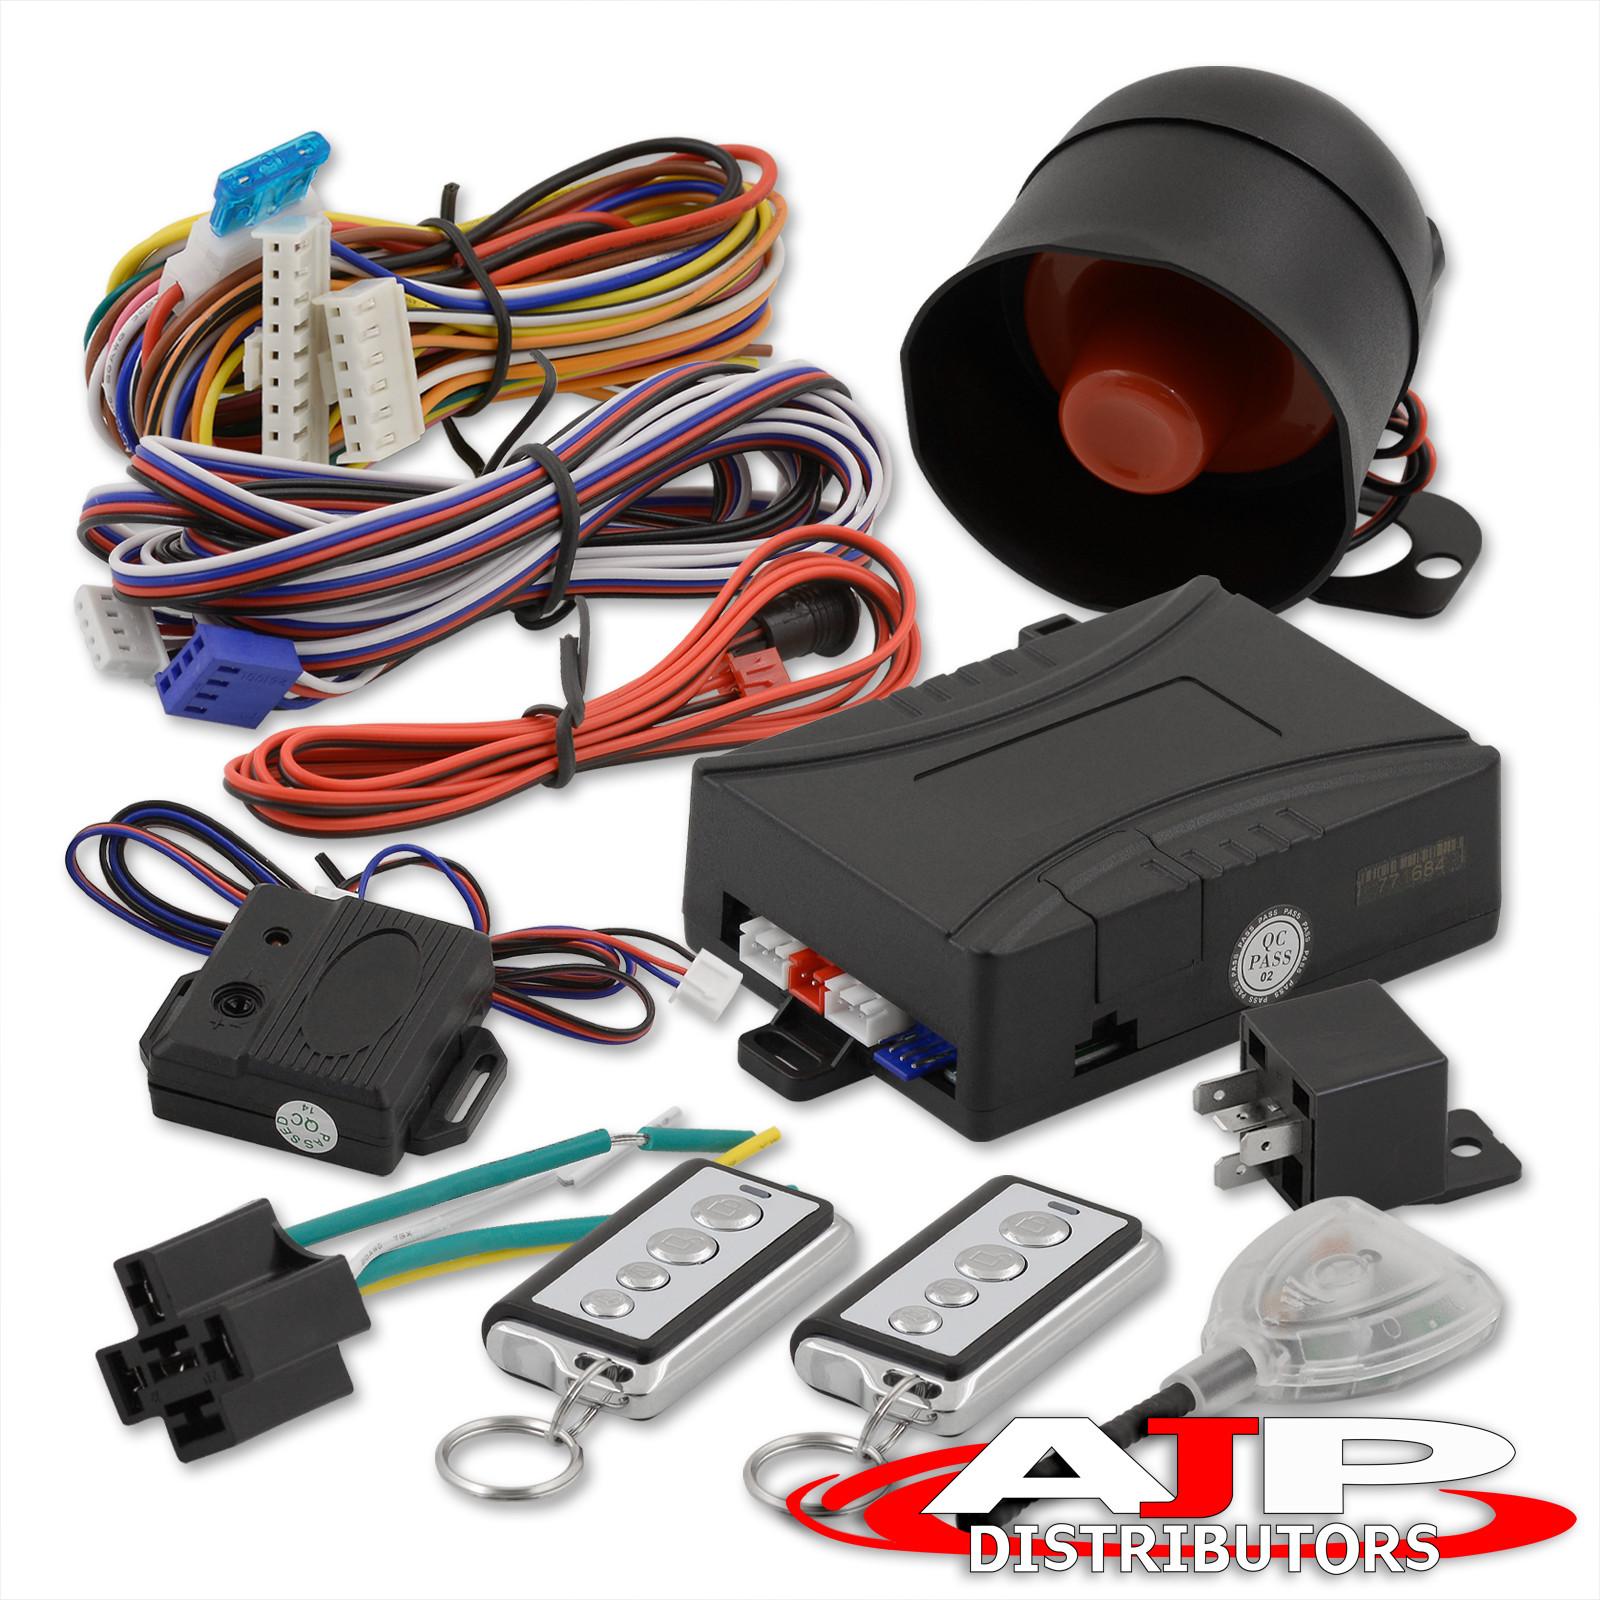 Jdm Remote Engine Start Car Alarm Security System W/ Wiring Celica Mr2  Corolla | eBay